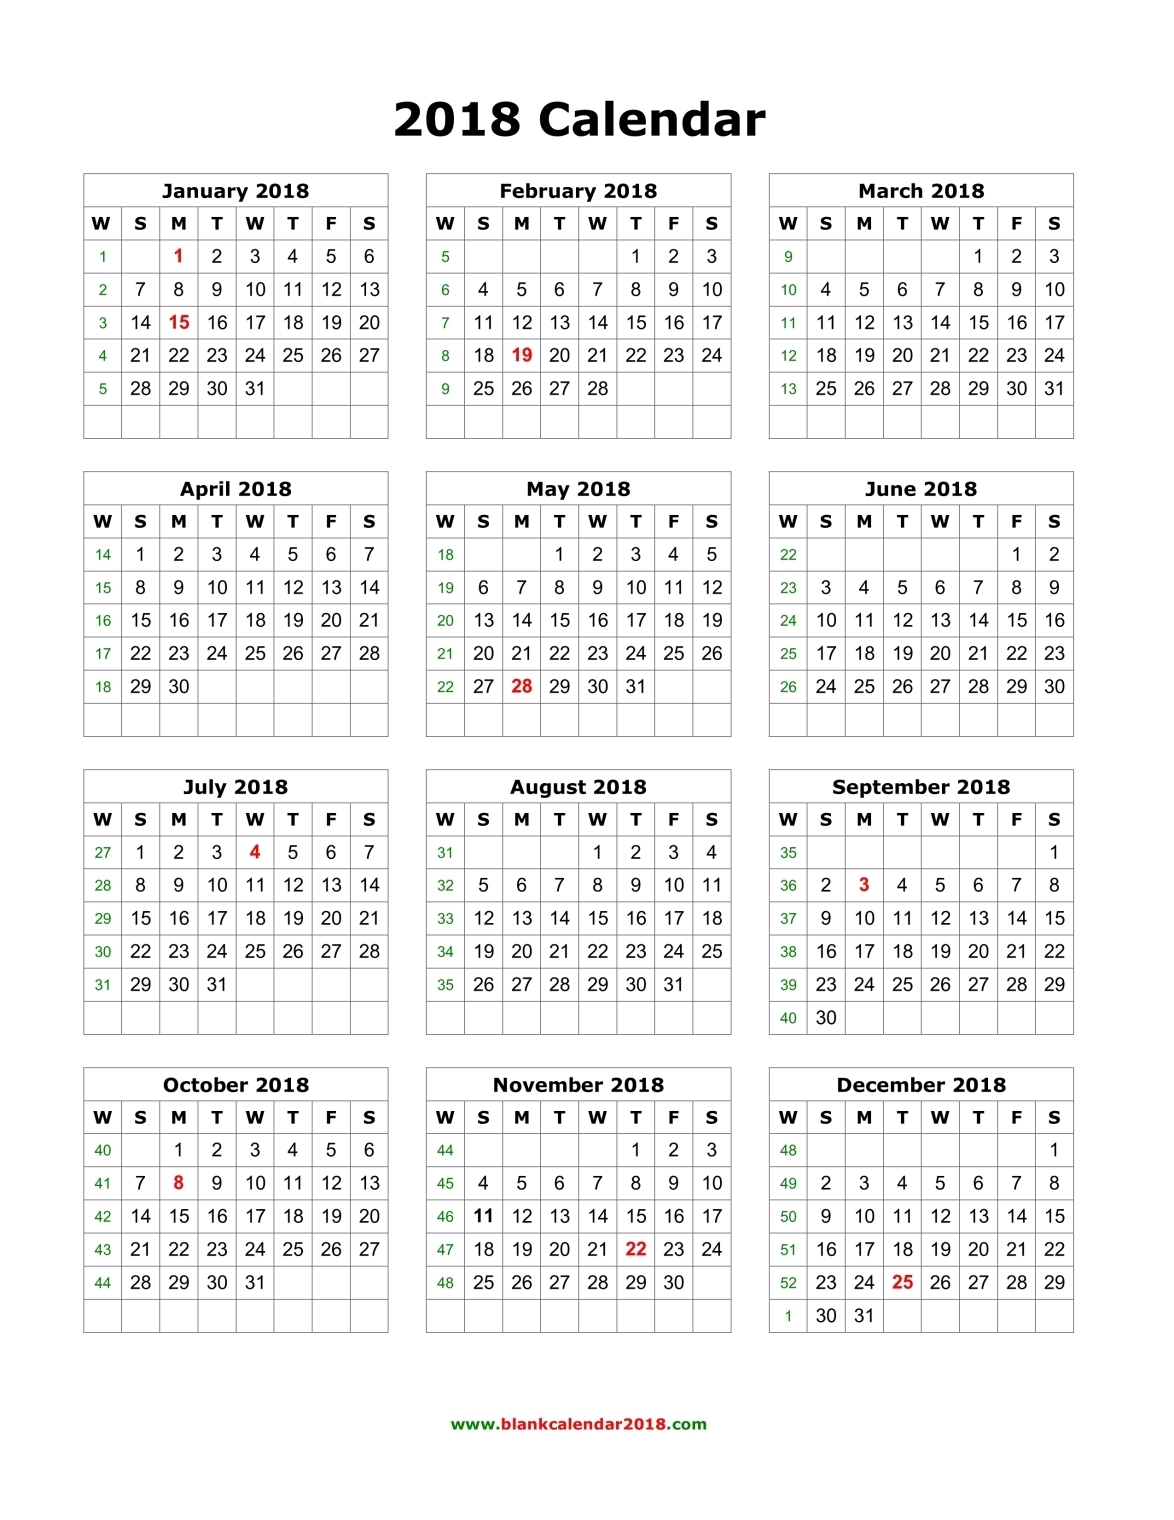 Get free blank printable 2017 2018 2019 2020 Calendar template